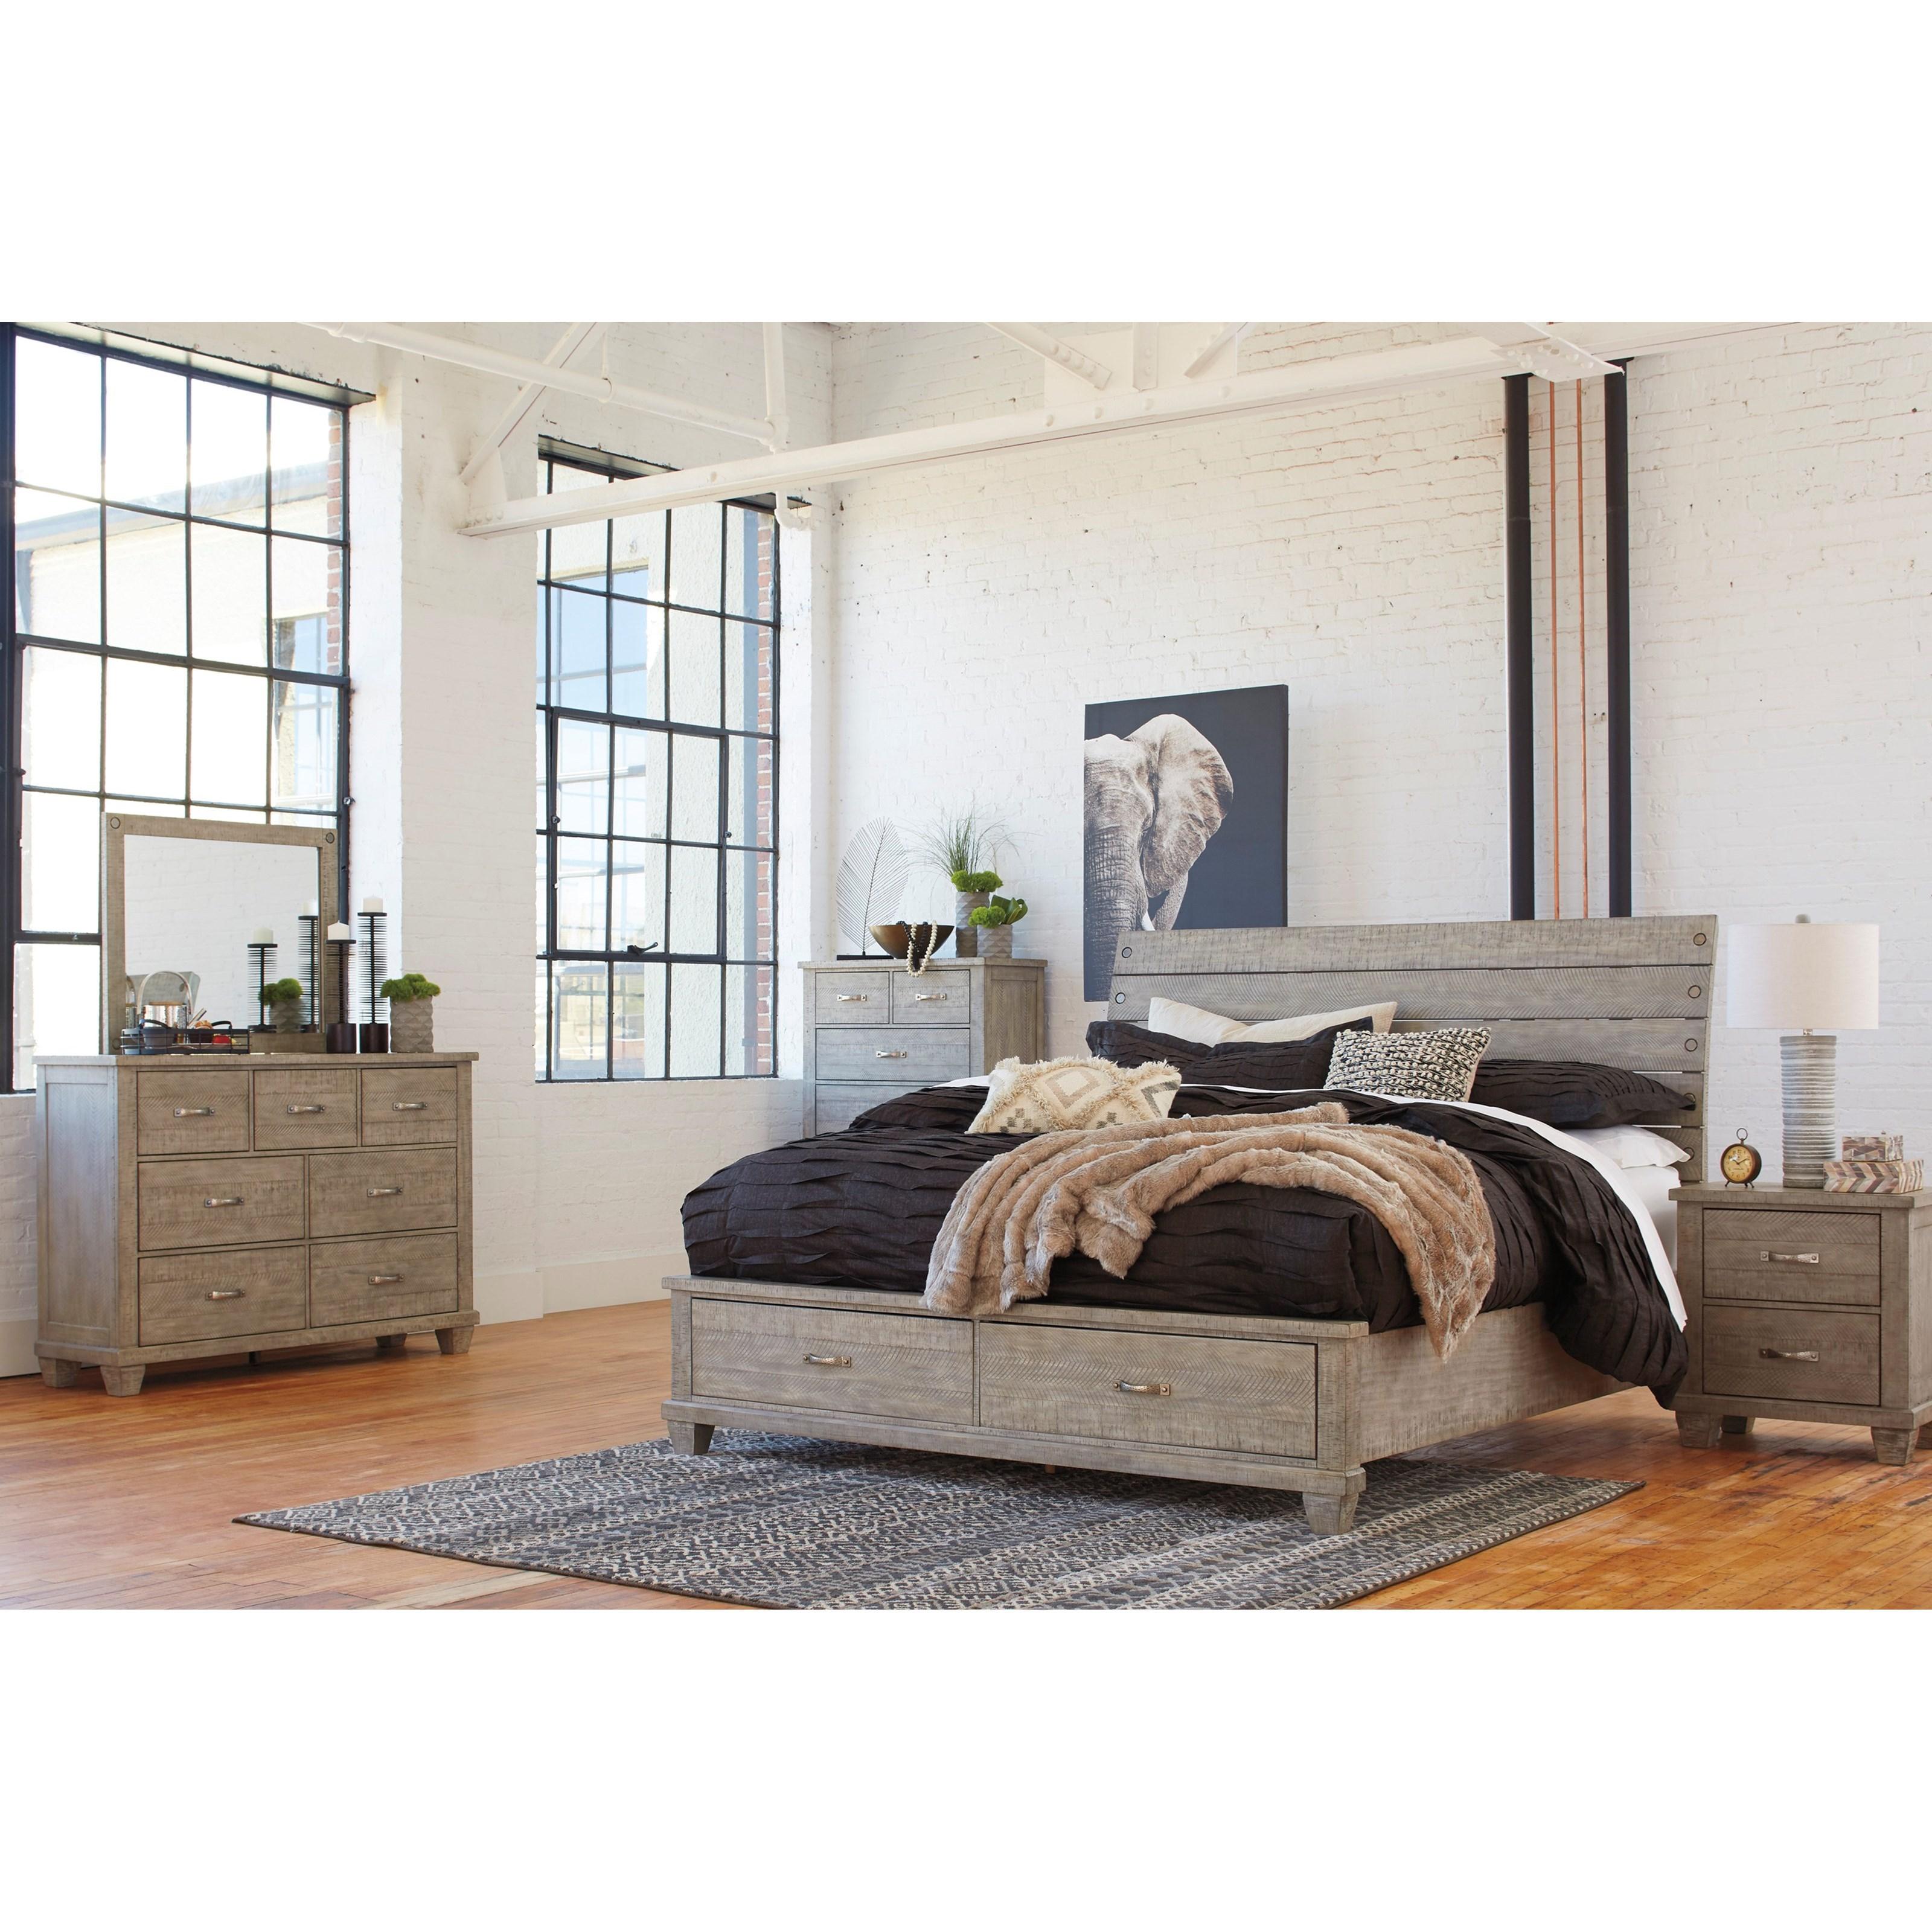 Naydell King Bedroom Group by Benchcraft at Walker's Furniture